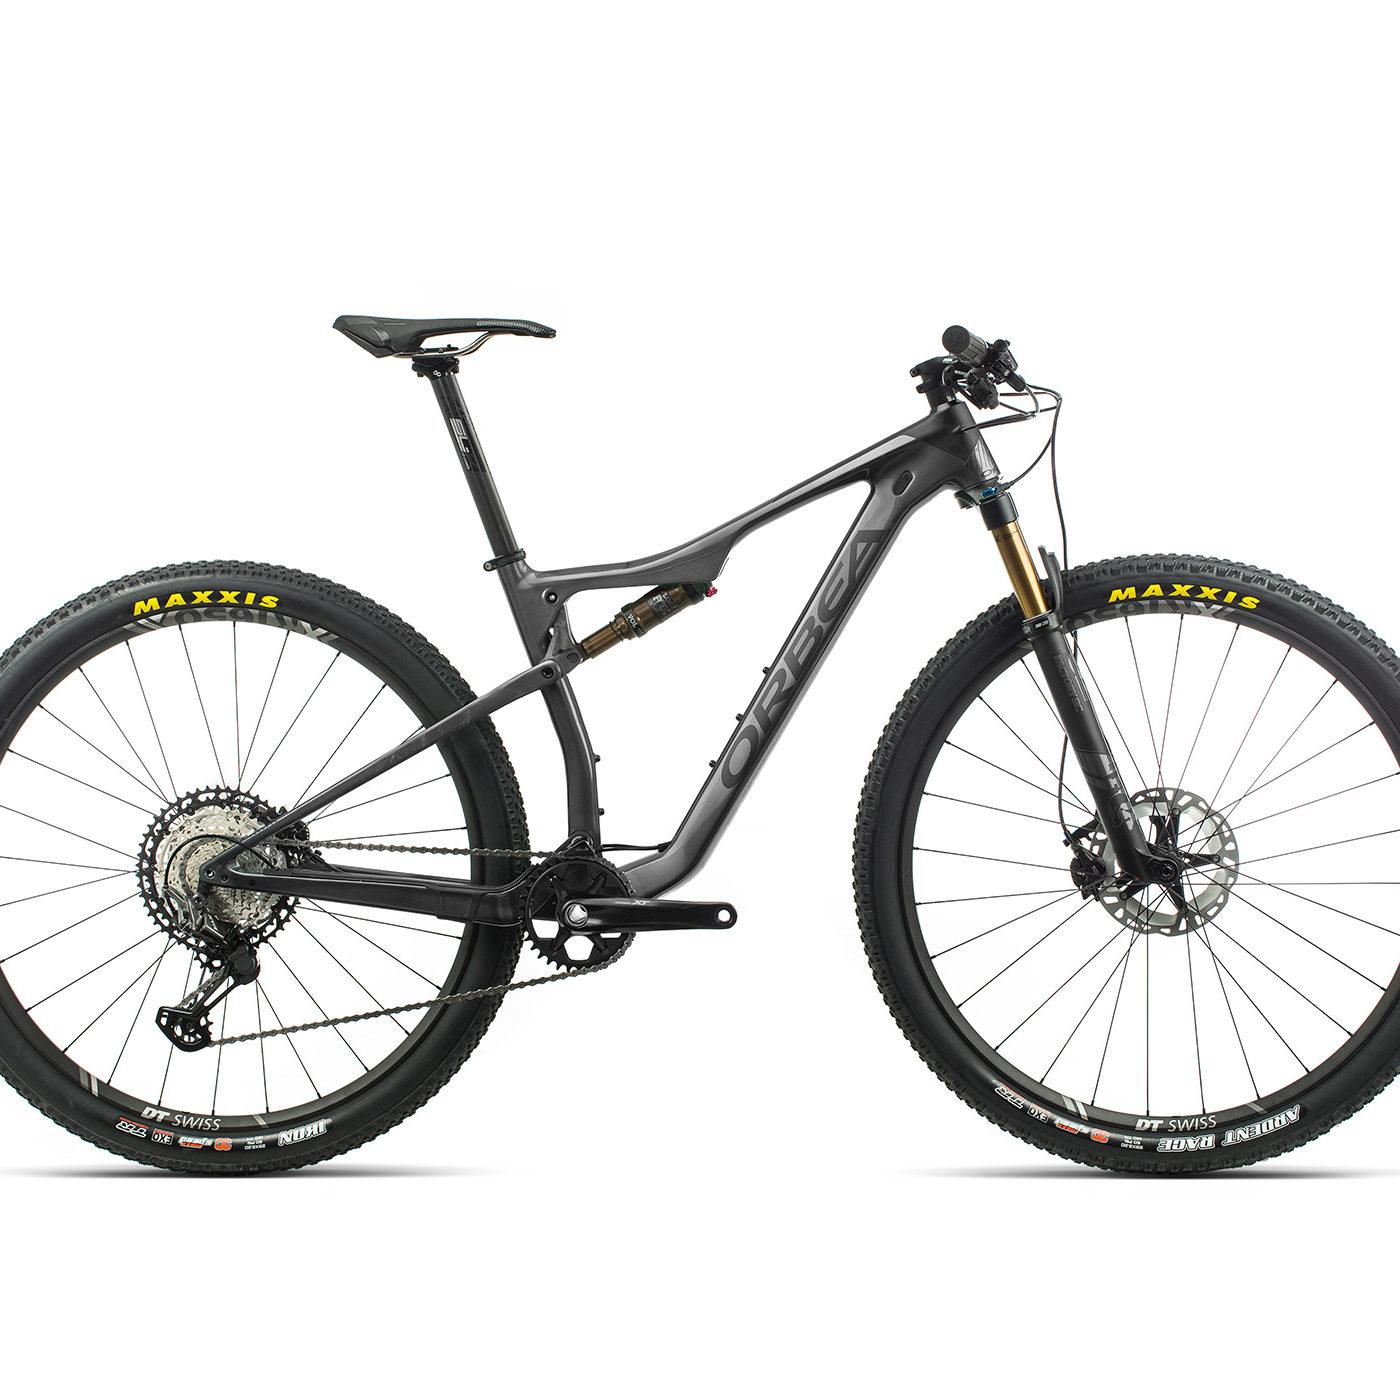 ORBEA OIZ 29 M10 - GRAFIET (GLOSS)/ ZWART (DOF) @G-Bikes